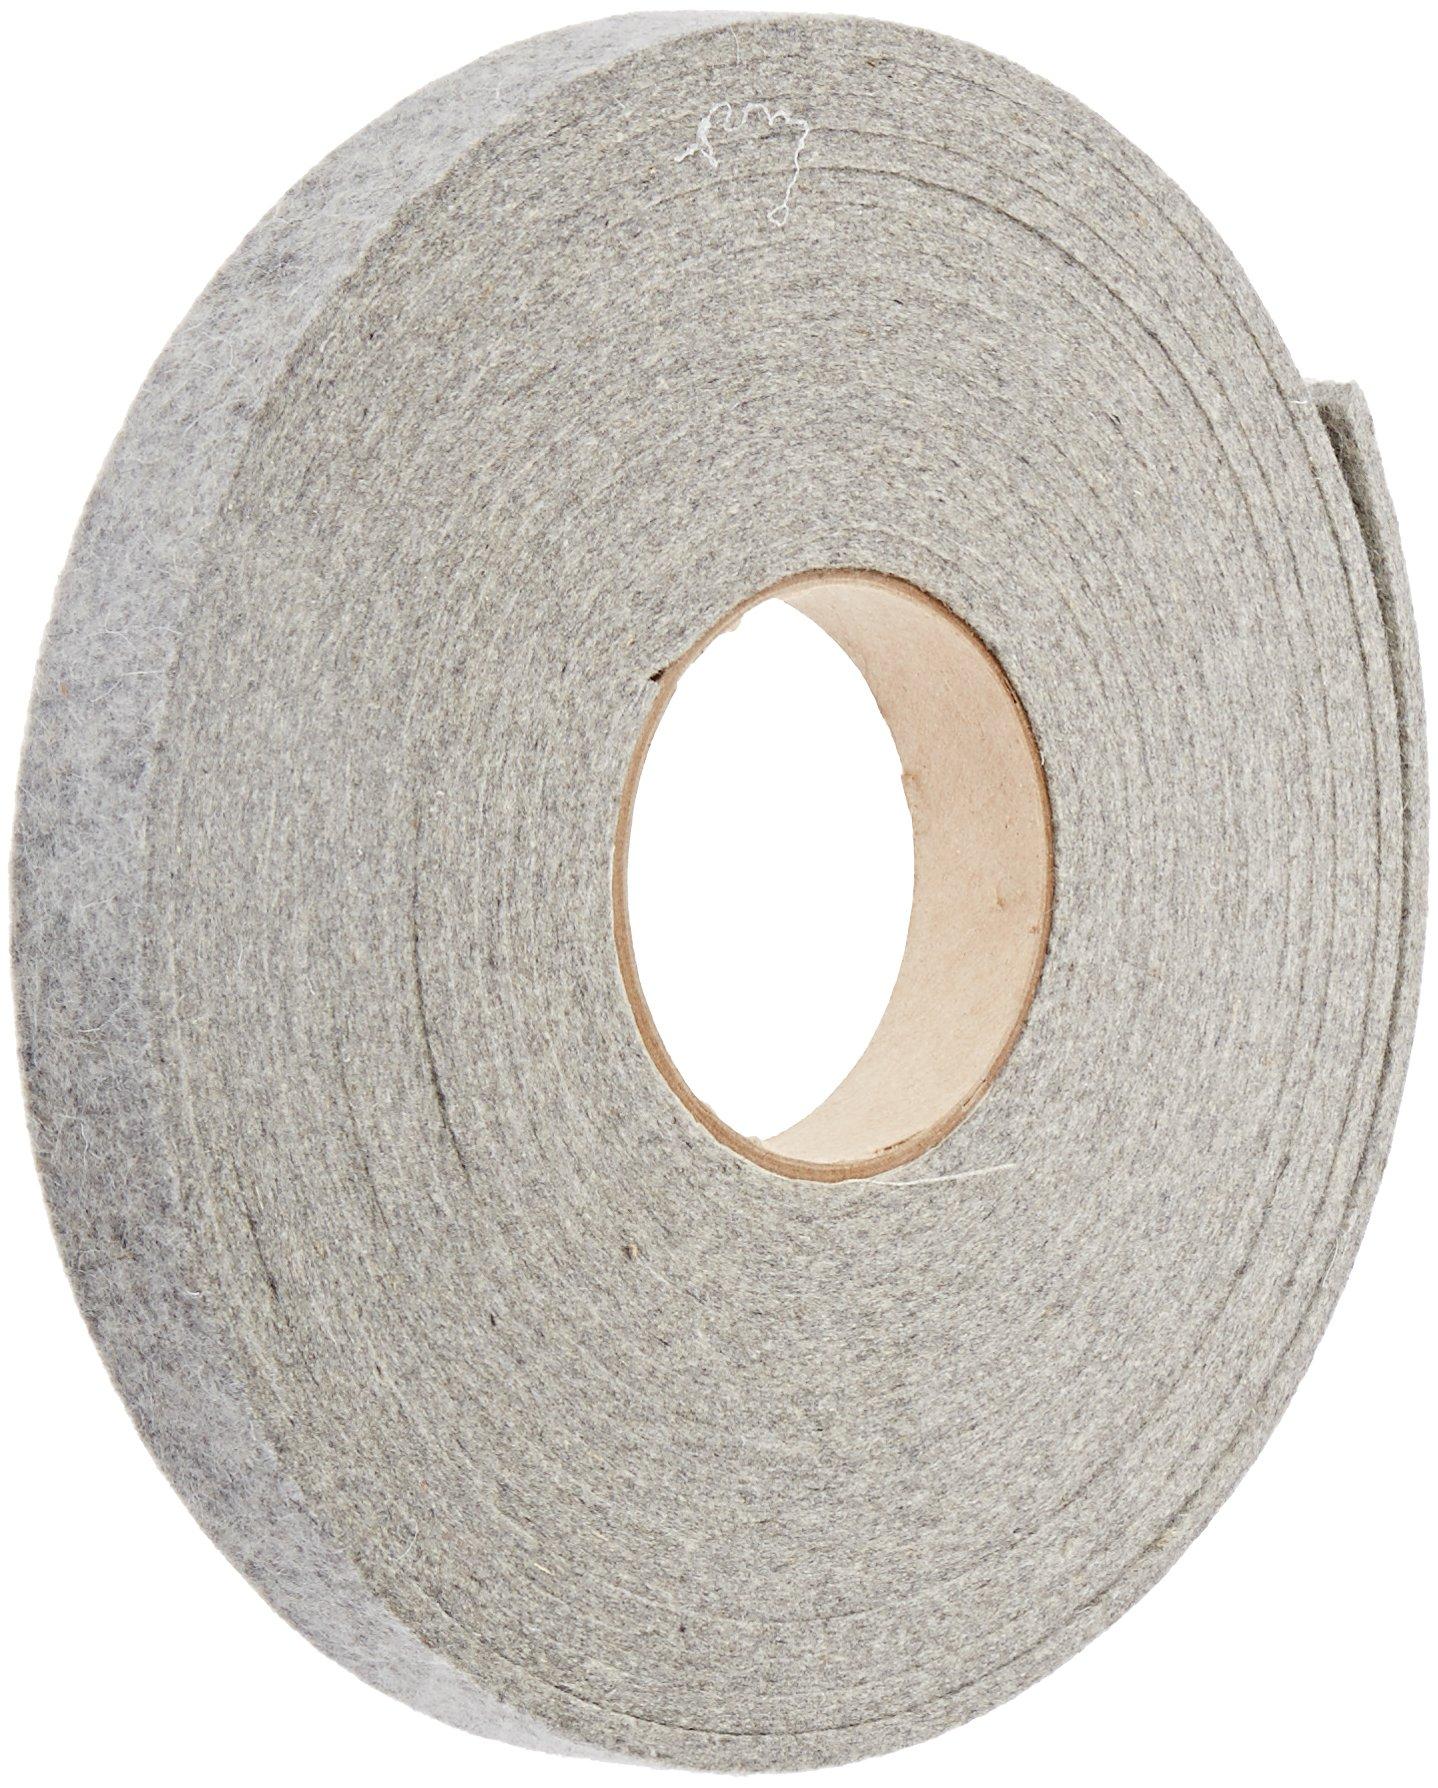 Grade F3 Pressed Wool Felt Strip, Gray, Meets SAE J314, 3/16'' Thickness, 1'' Width, 25' Length